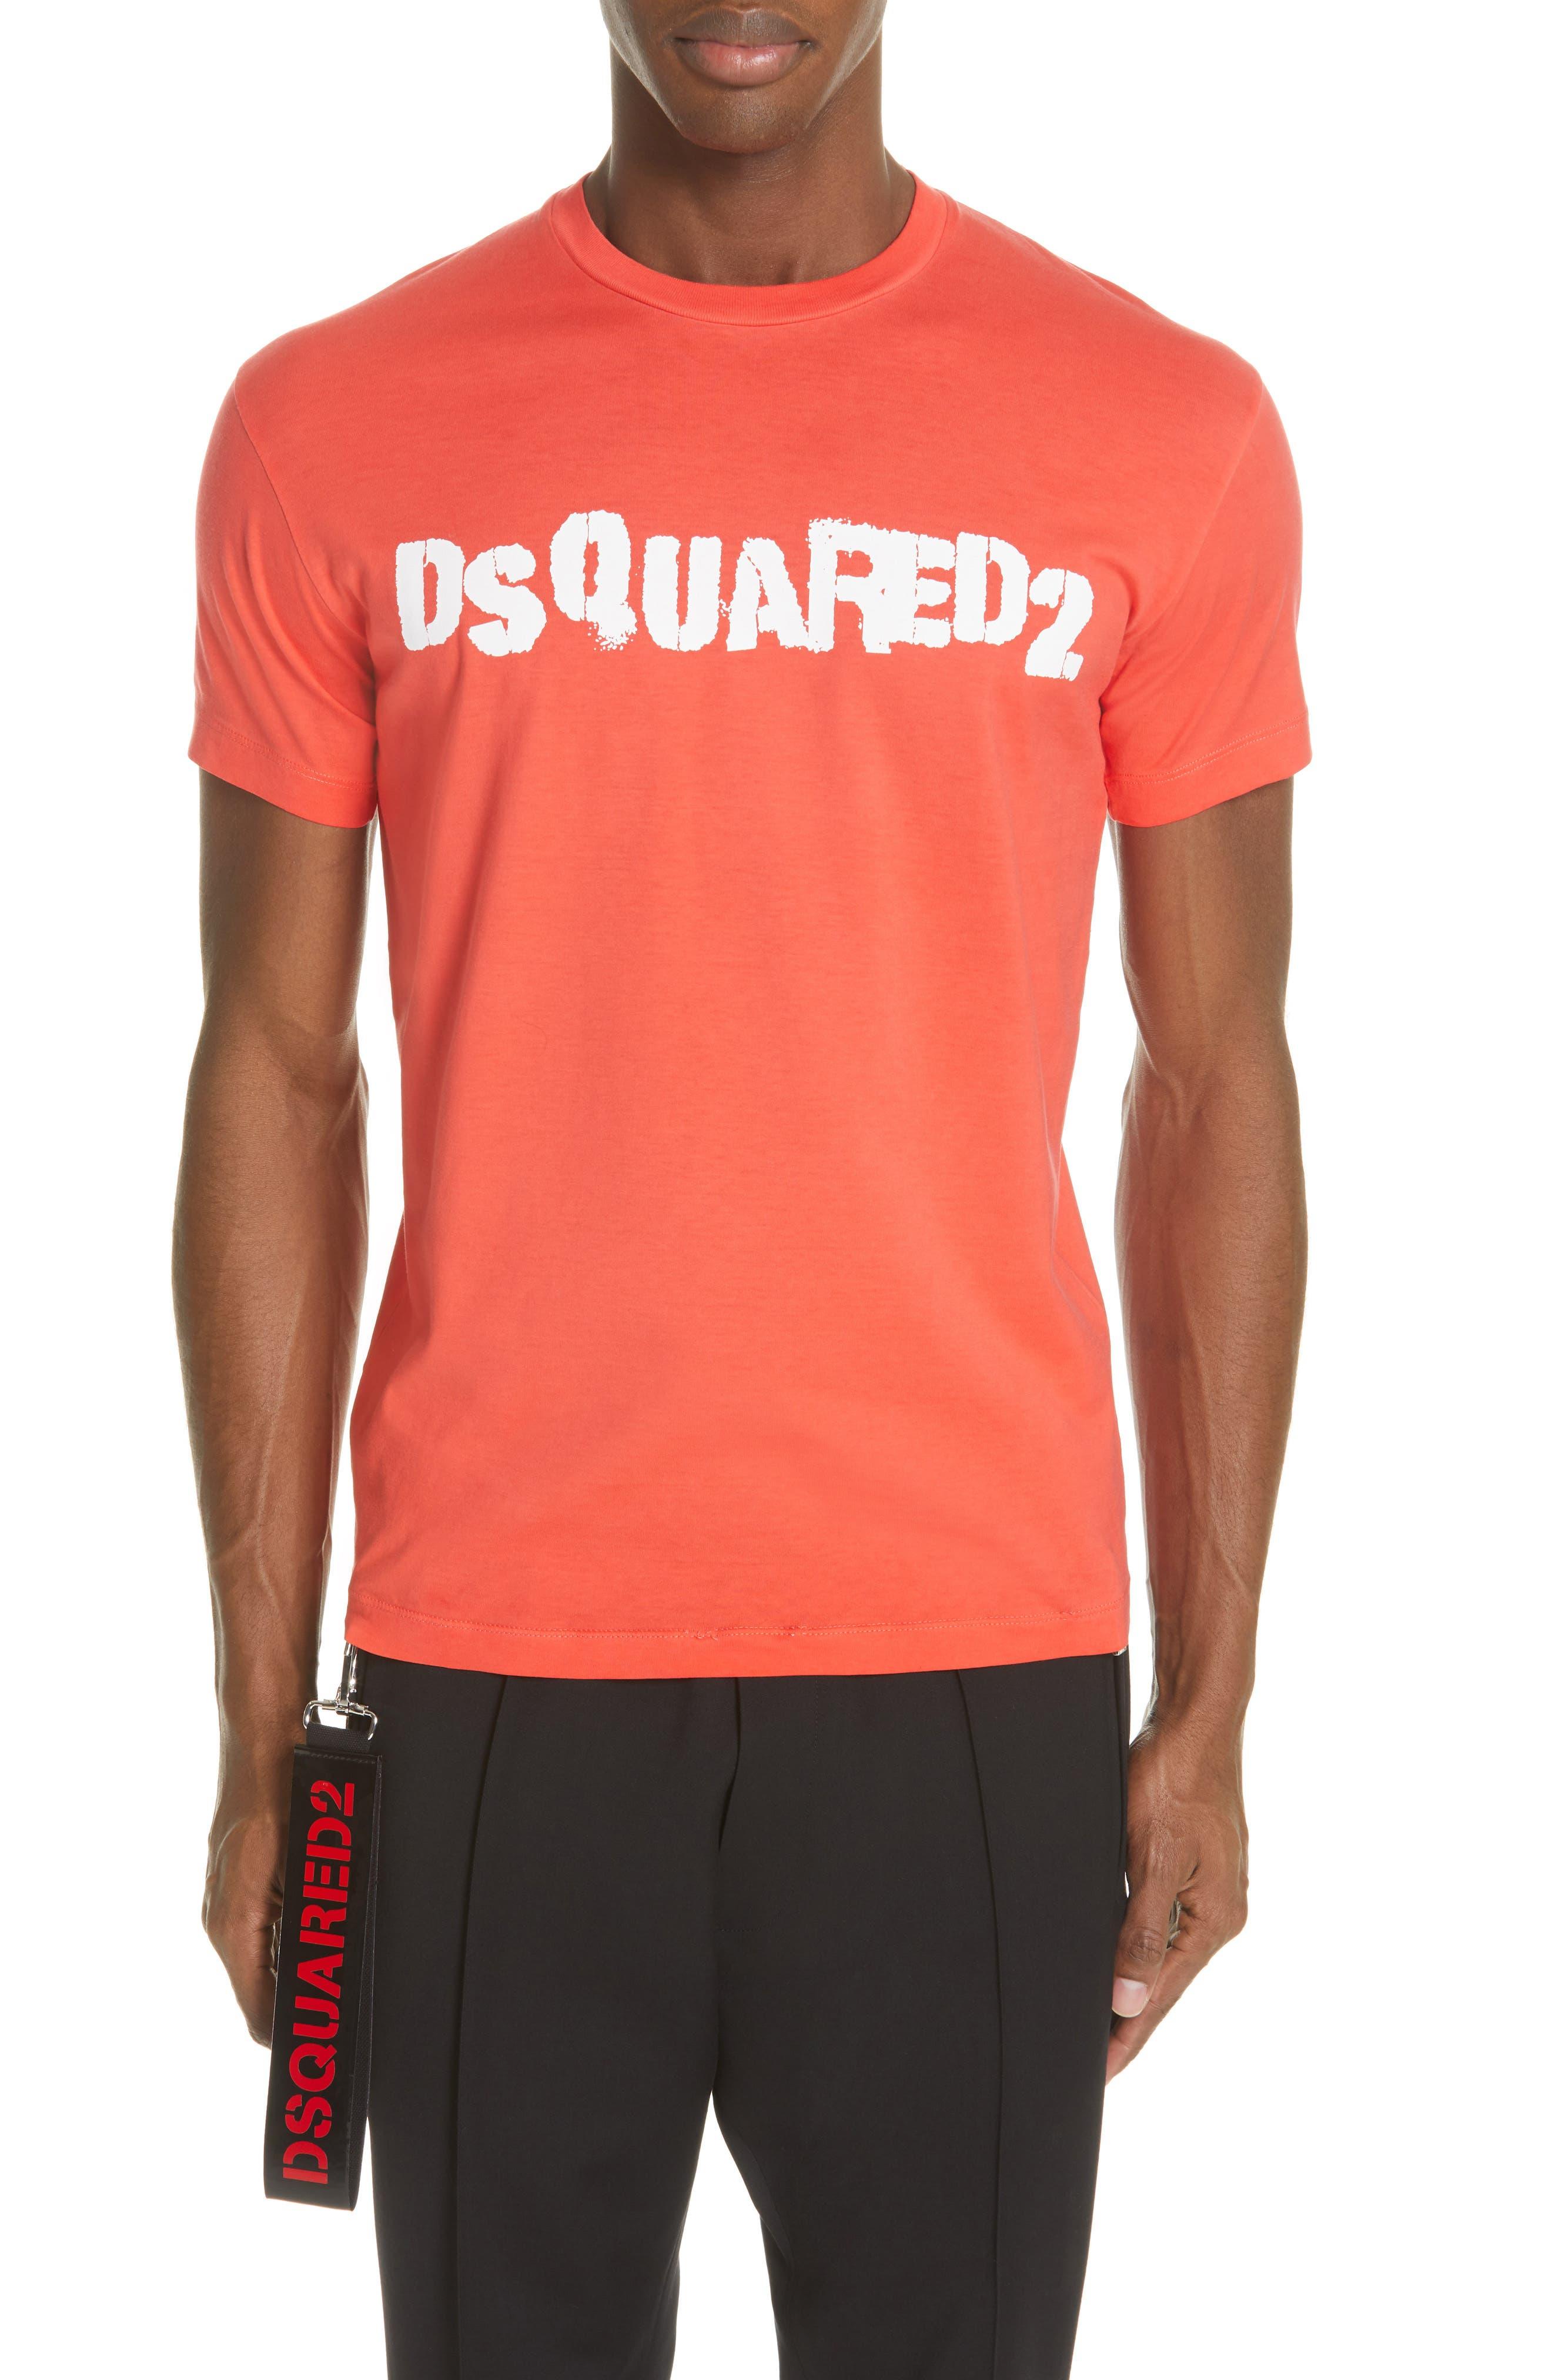 ec0e3d79bc7f8 Men s Dsquared2 T-Shirts